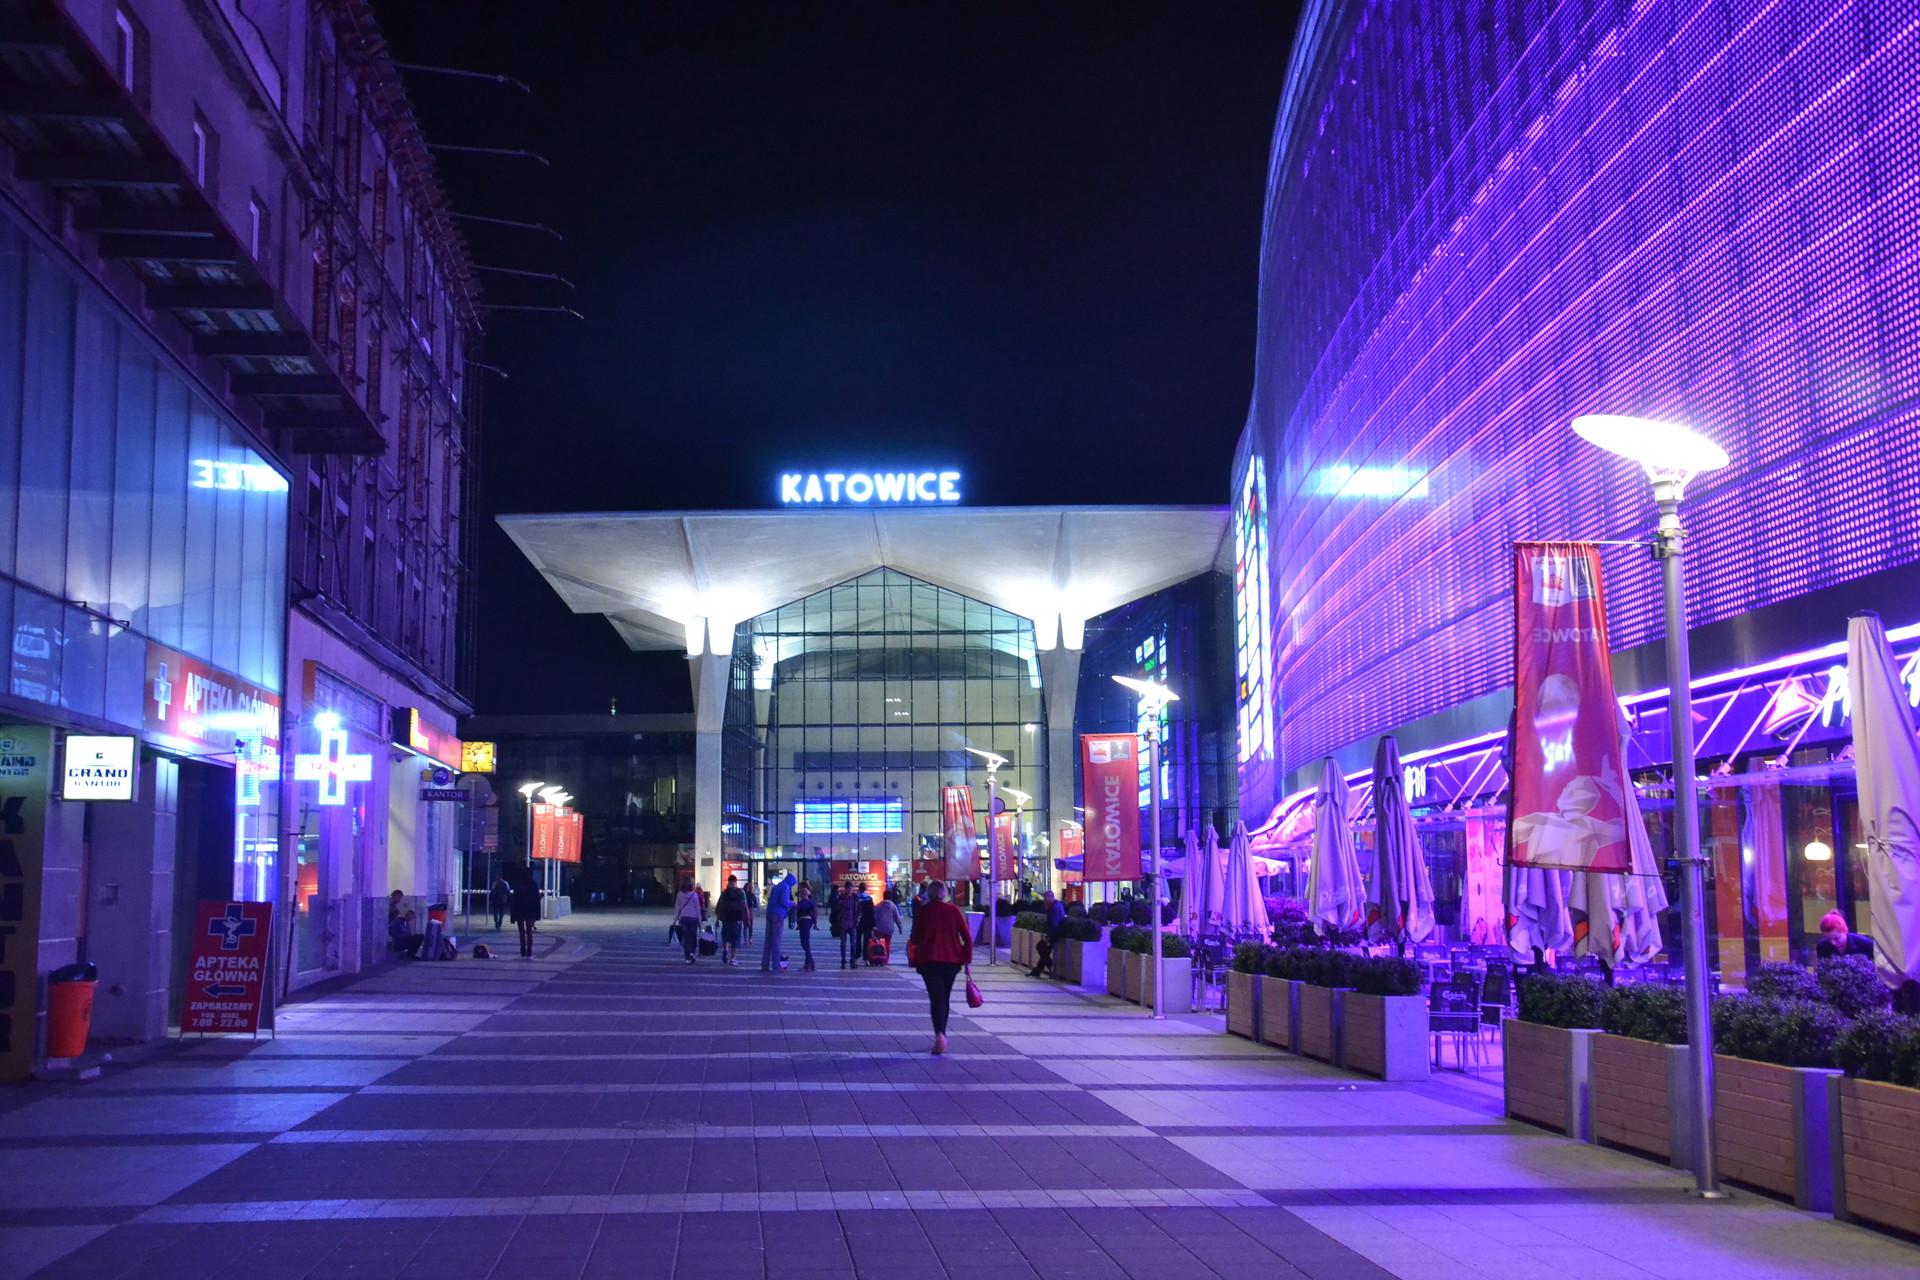 Experiencia en Katowice, Polonia por Natalia